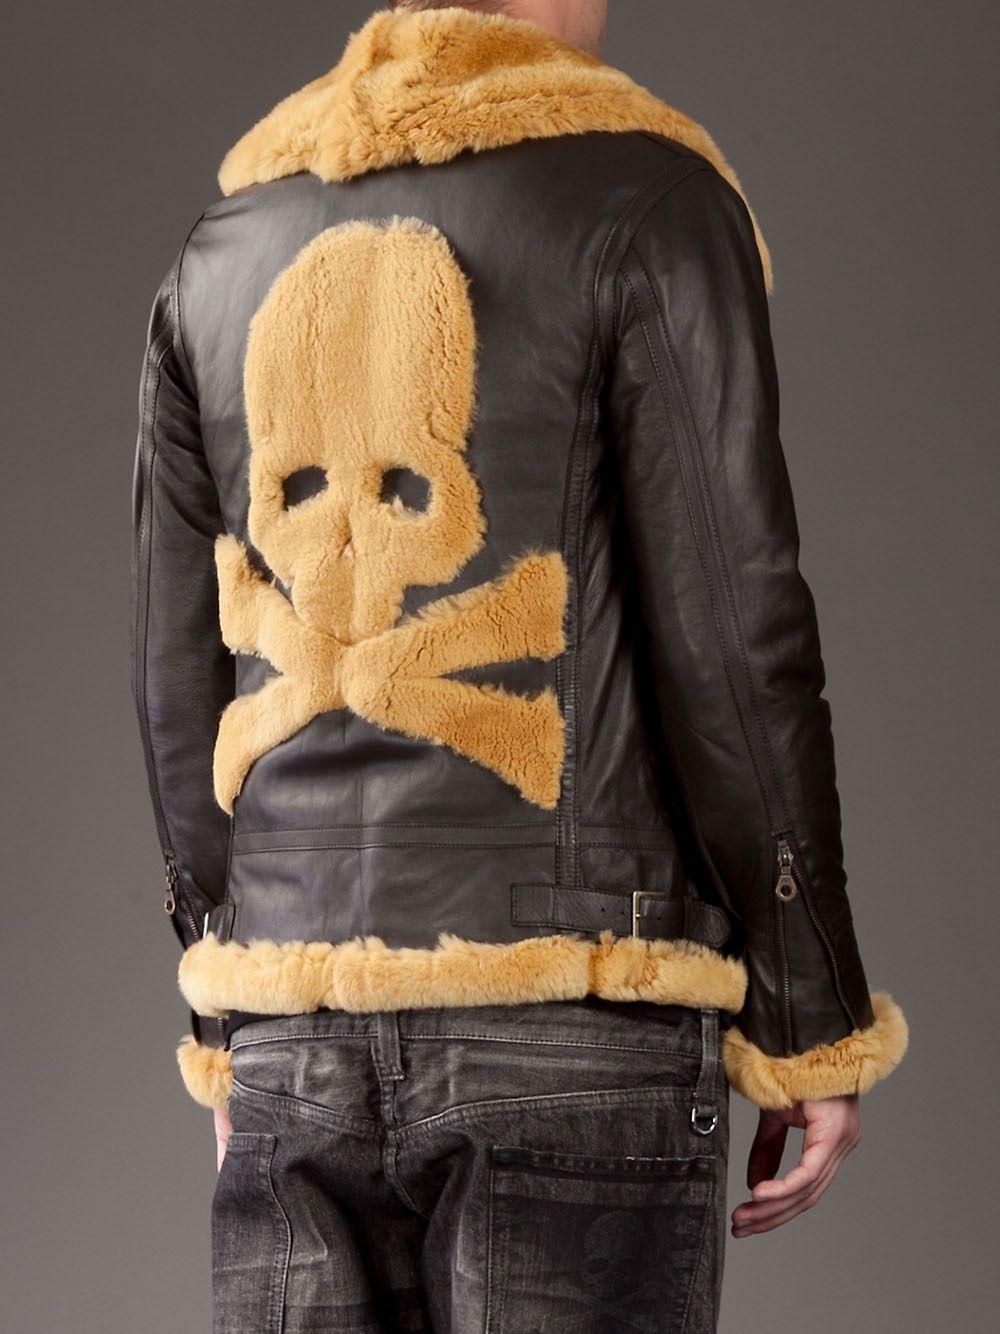 f977c5115a Mastermind Japan Rabbit Fur Flight Jacket Source   farfetch.com - a new way  to shop for fashion